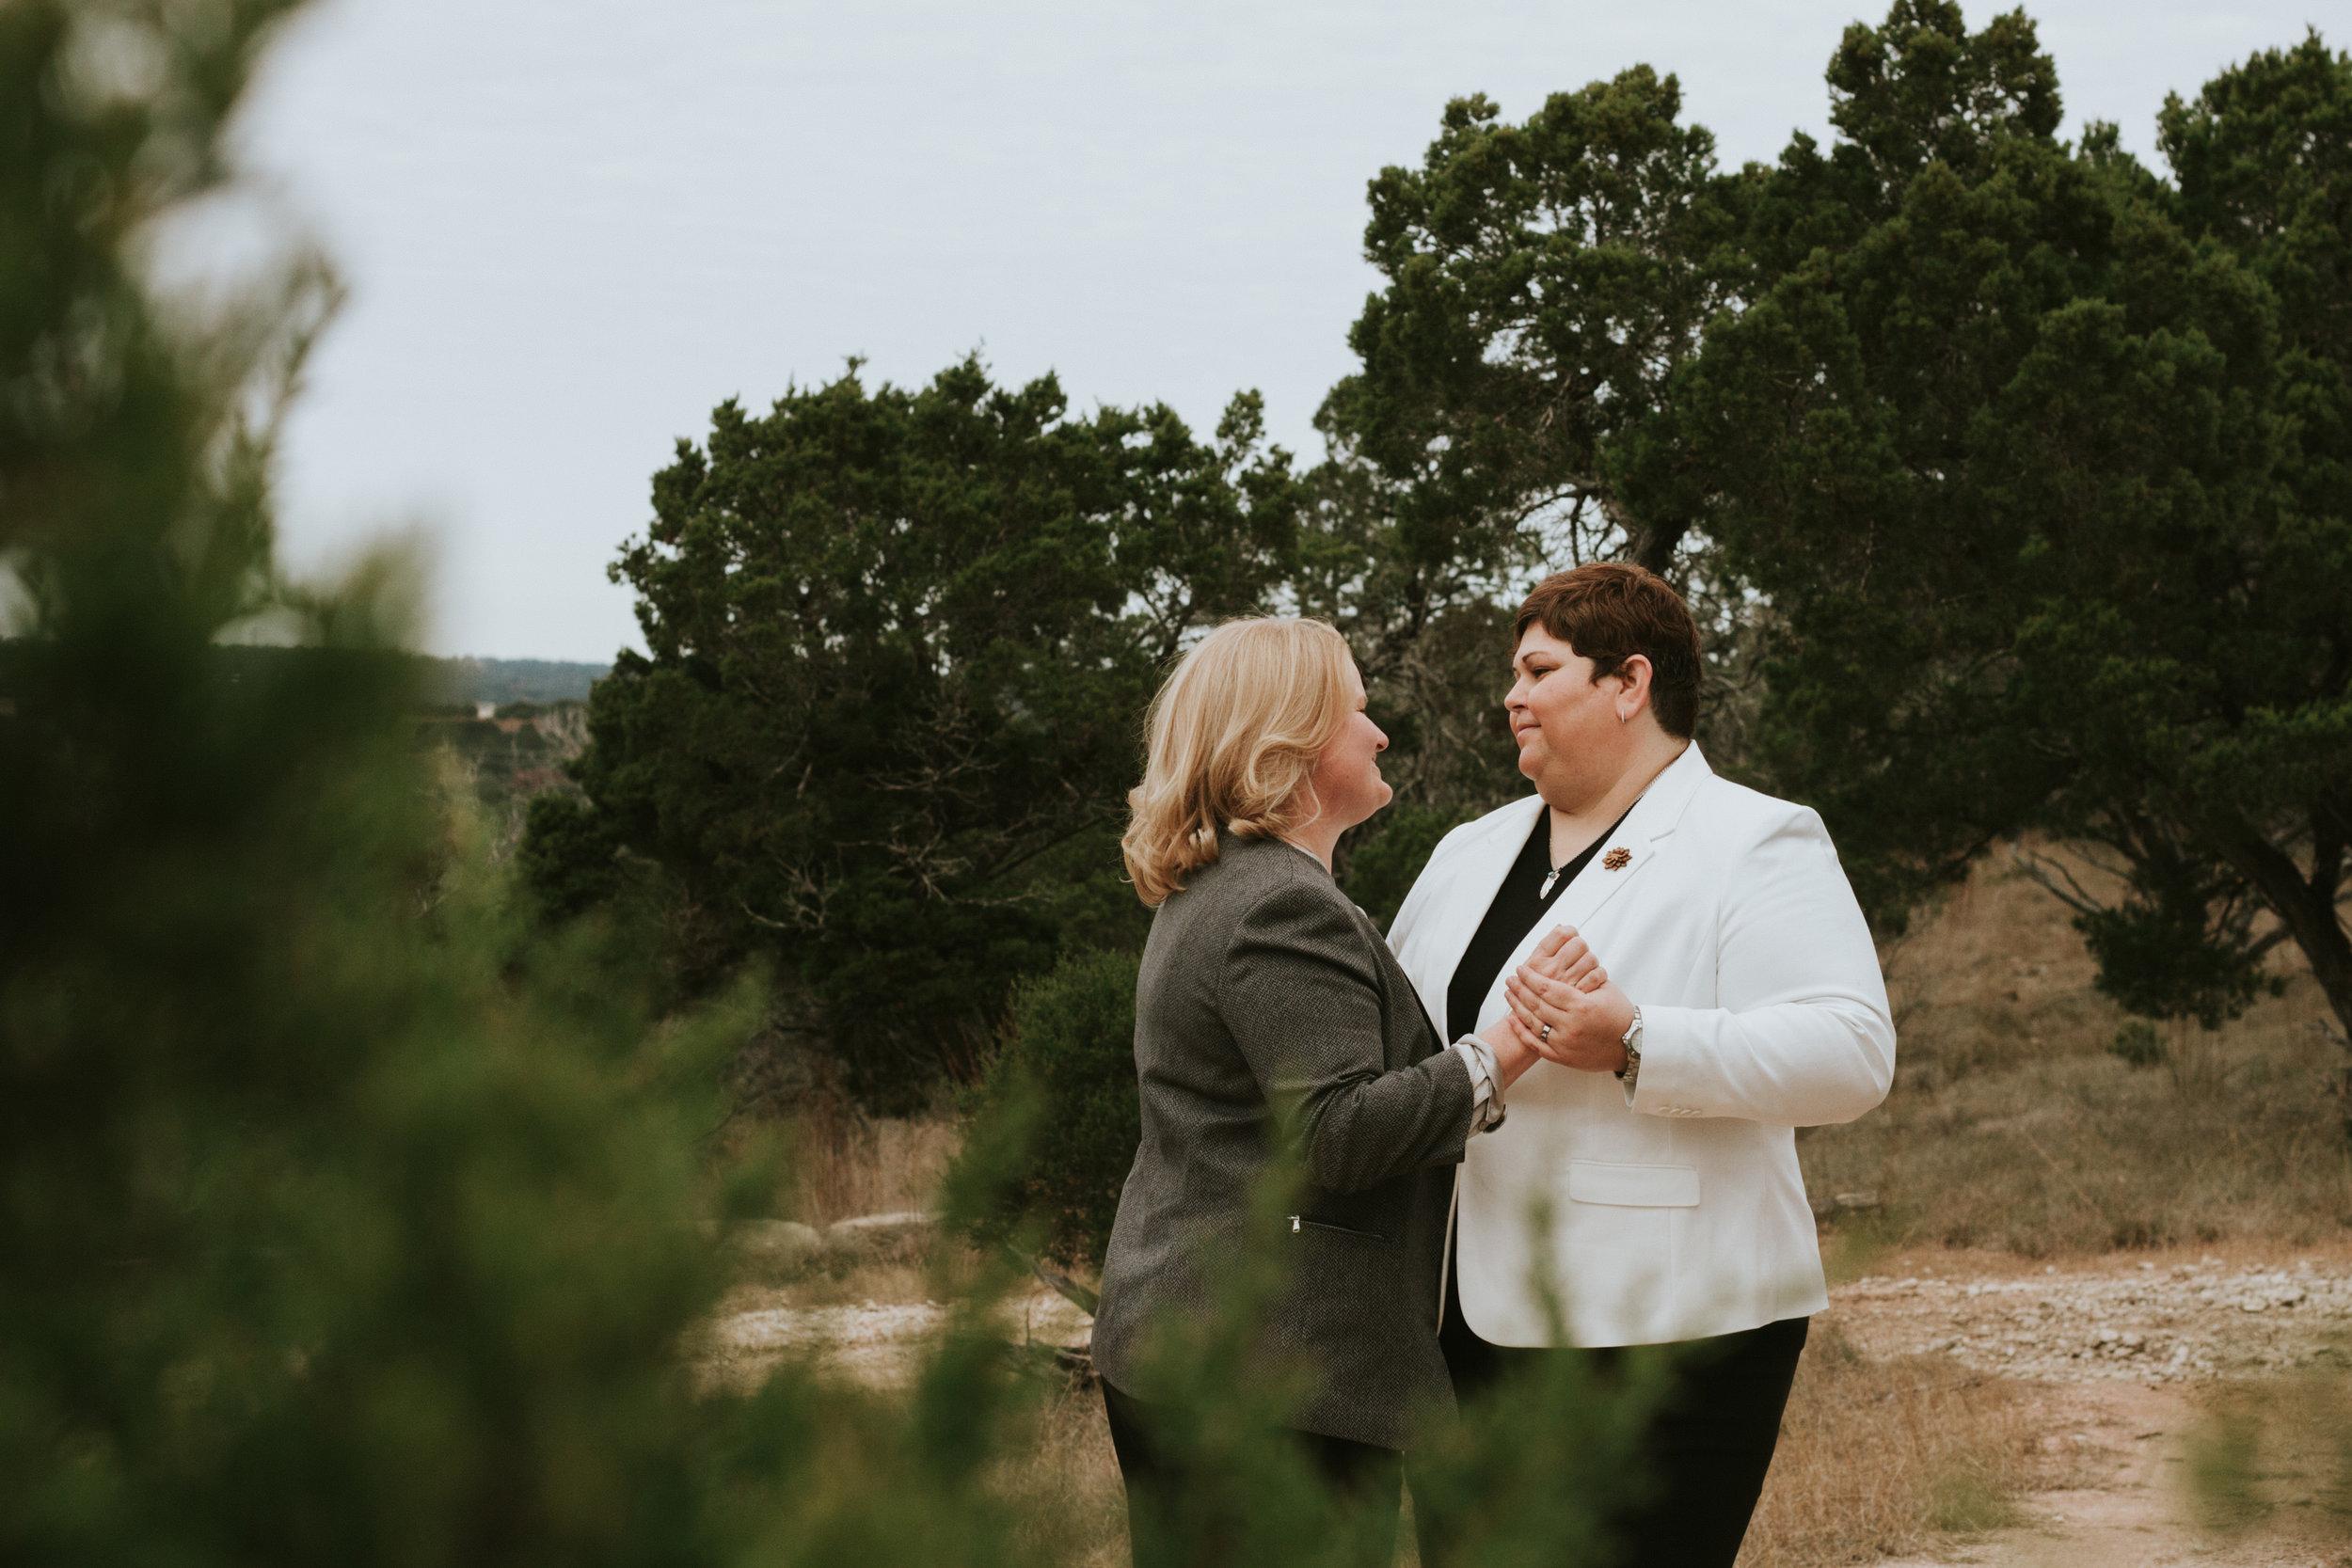 Mari and Johanna Wedding - Diana Ascarrunz Photography-61.JPG